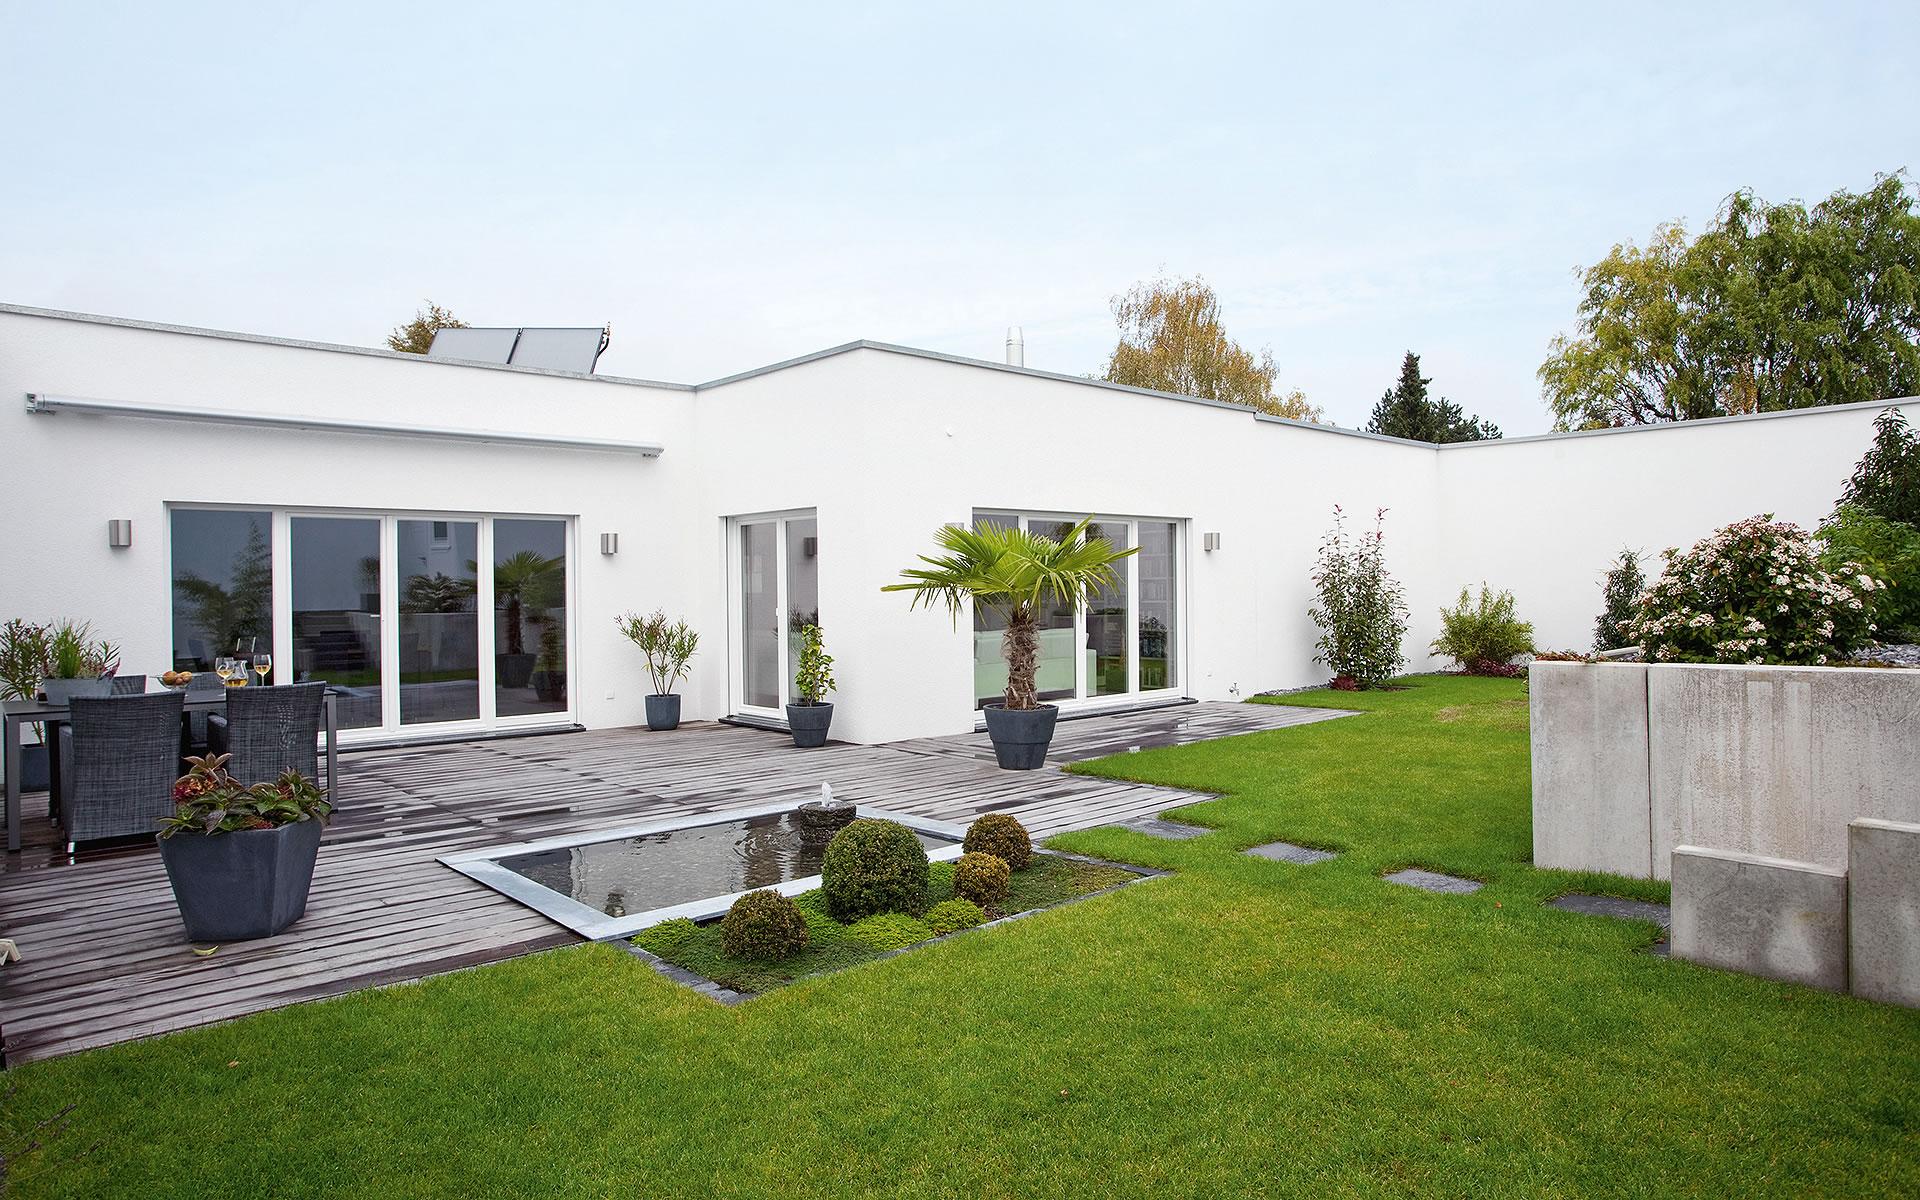 Bungalow (Volz) von WeberHaus GmbH & Co. KG